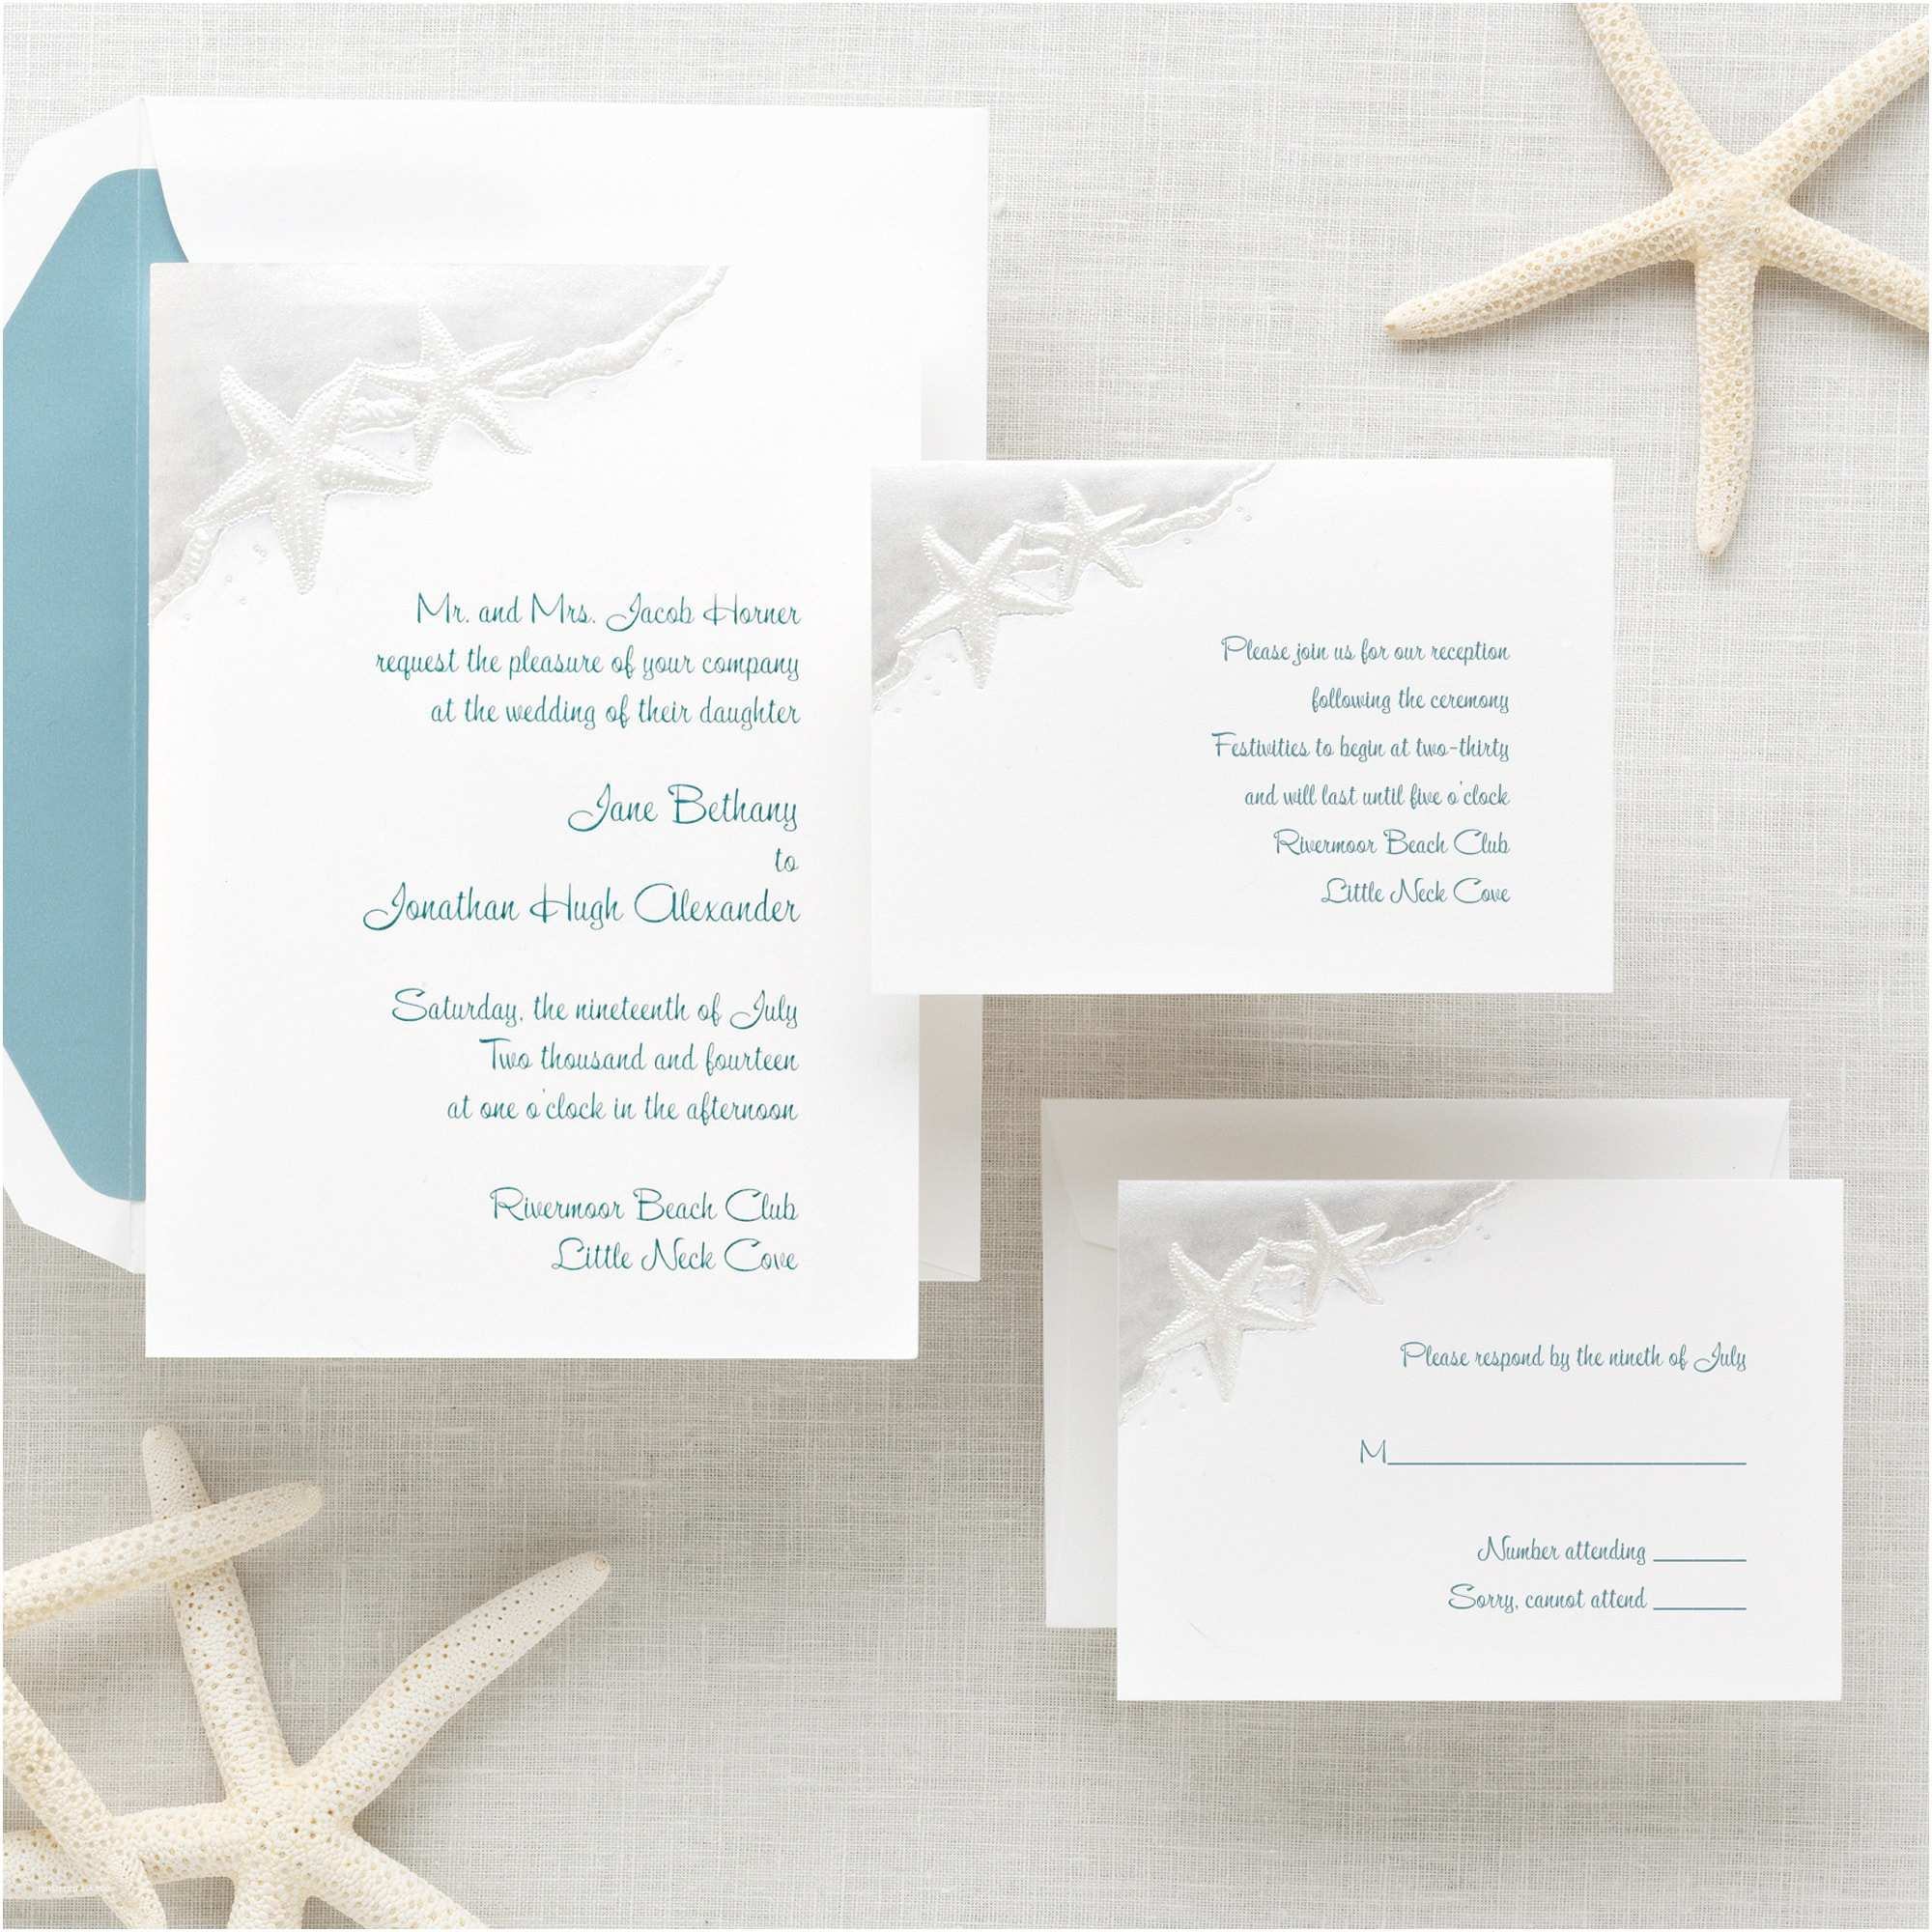 Cheap Destination Wedding Invitations Beach theme Wedding Invitations Latest Ideas S with